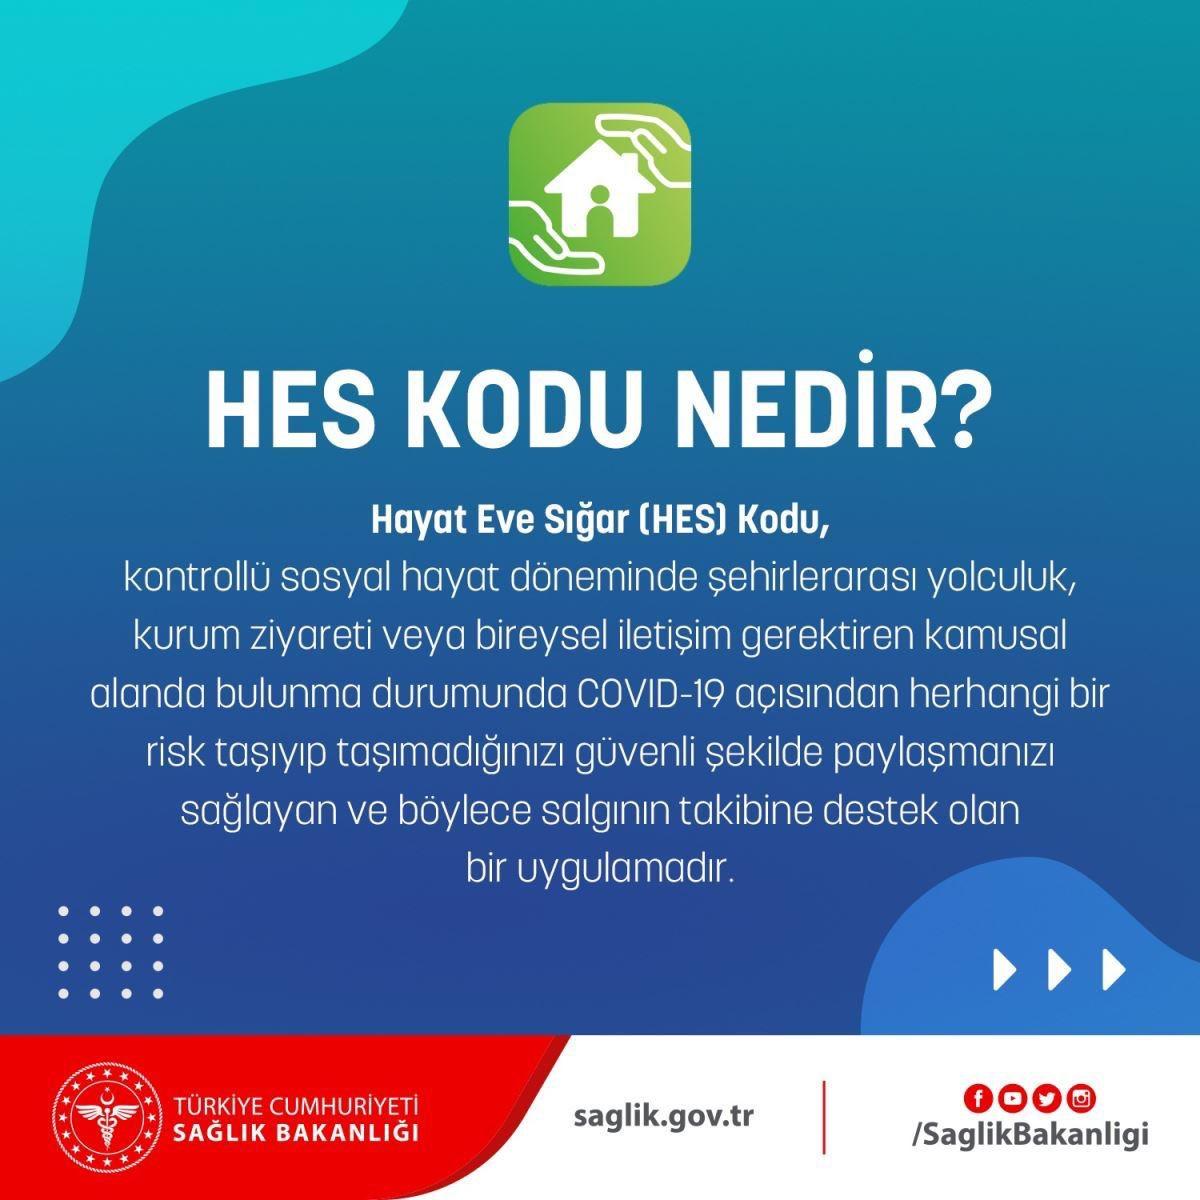 İstanbul HES Kodu nerelerde zorunlu oldu? | İstanbul HES kodu zorunlu olan yerler nereler?